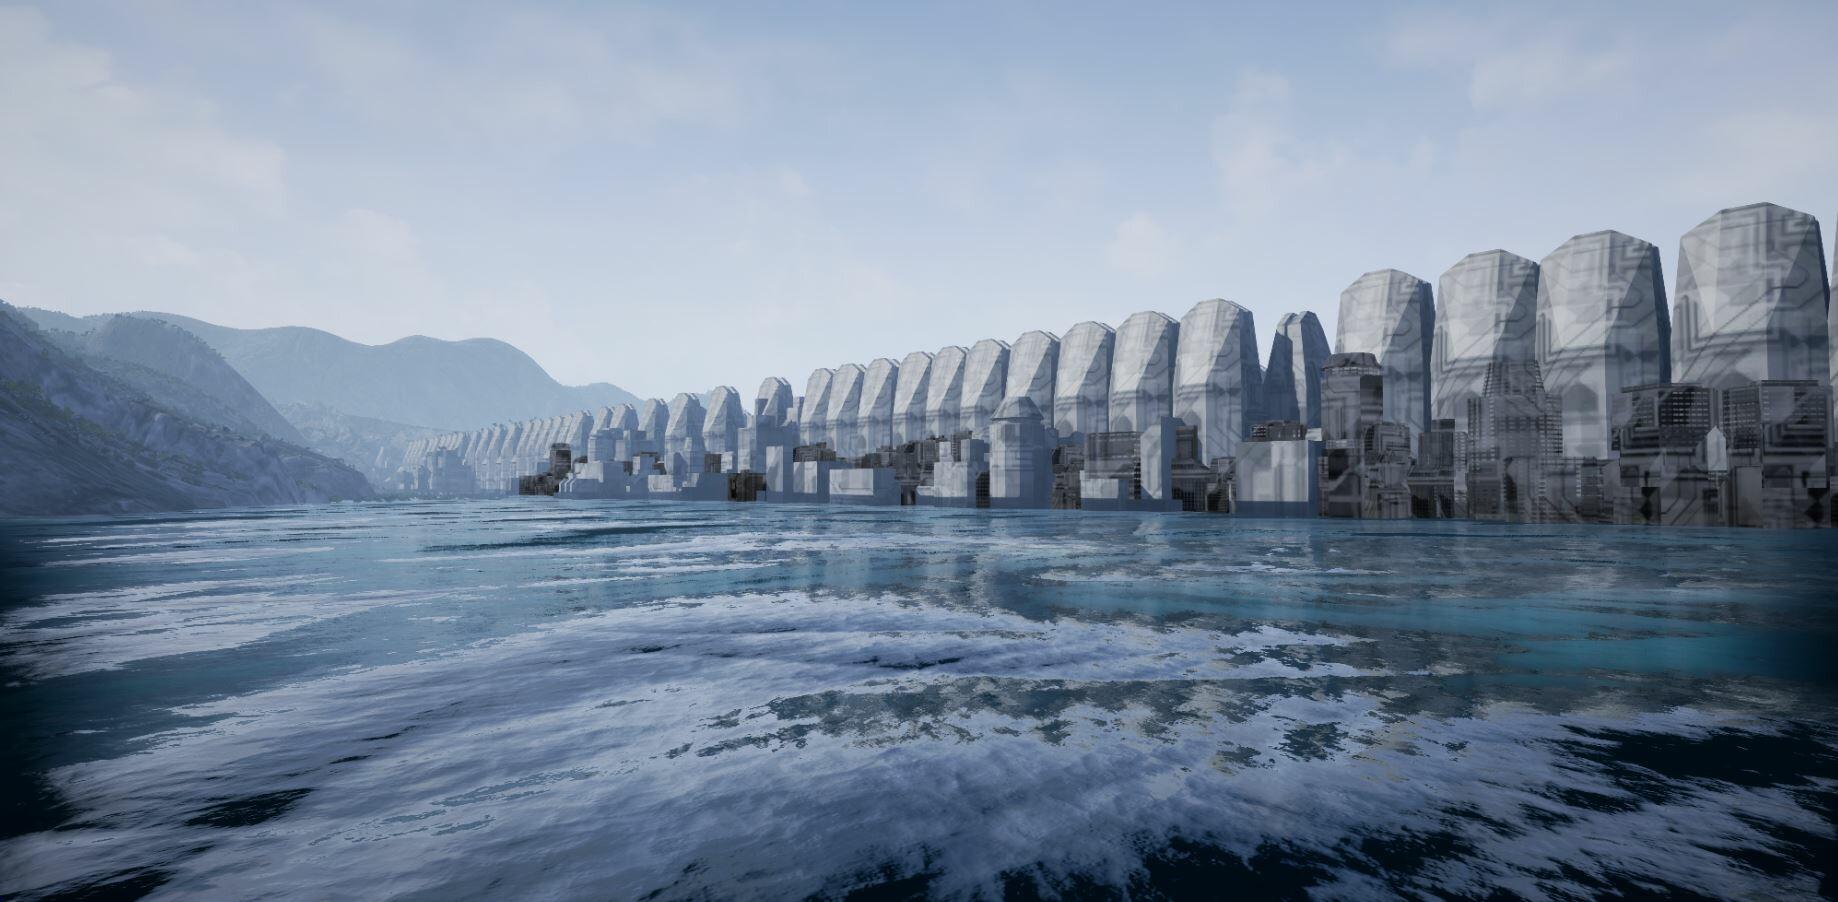 Recep Köksal - Sci-Fi City